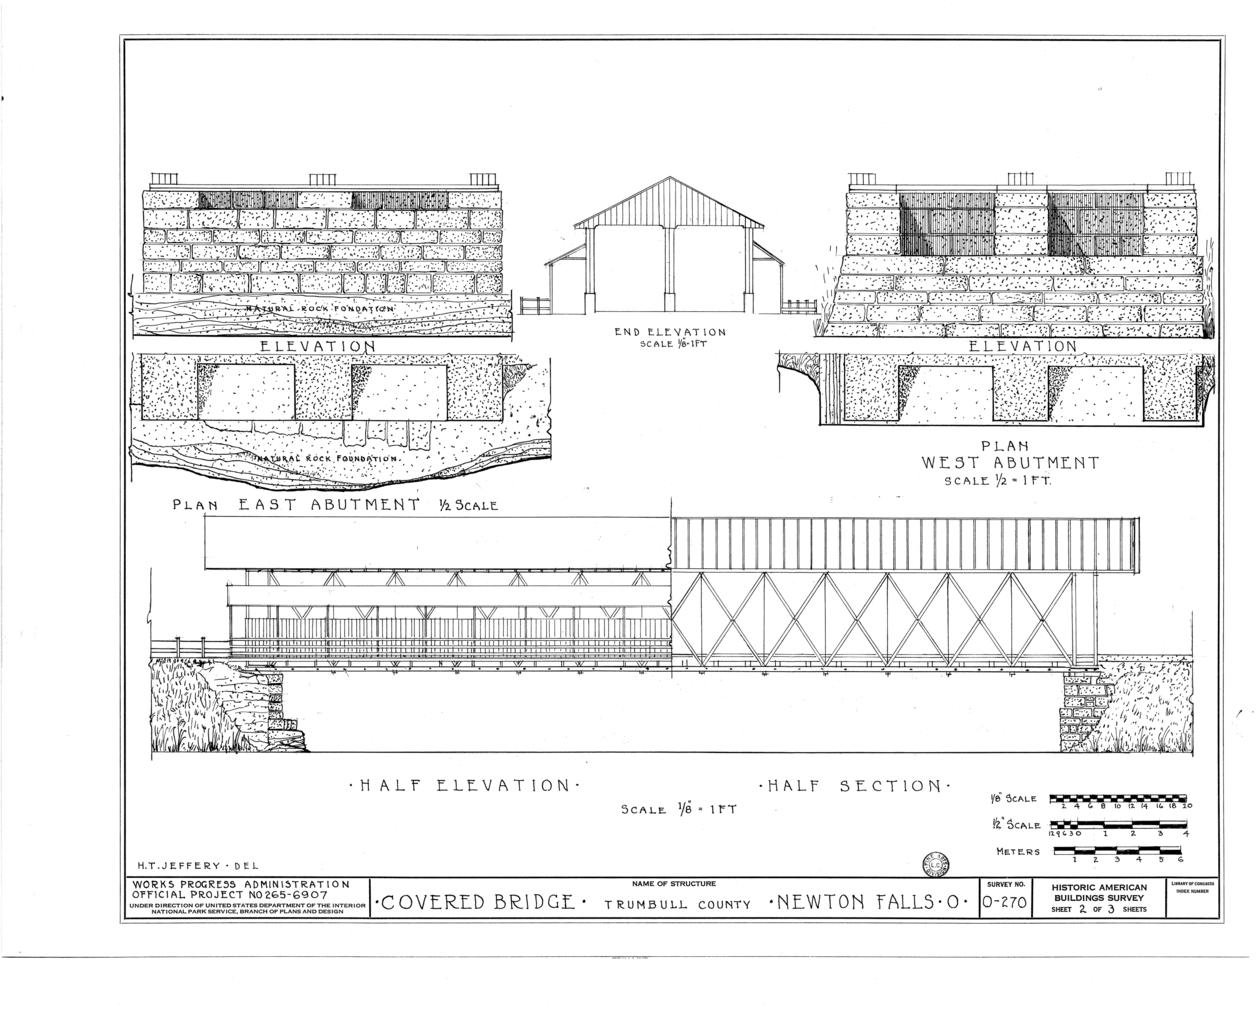 File elevations end elevation plan east abutment plan for Covered bridge design plans